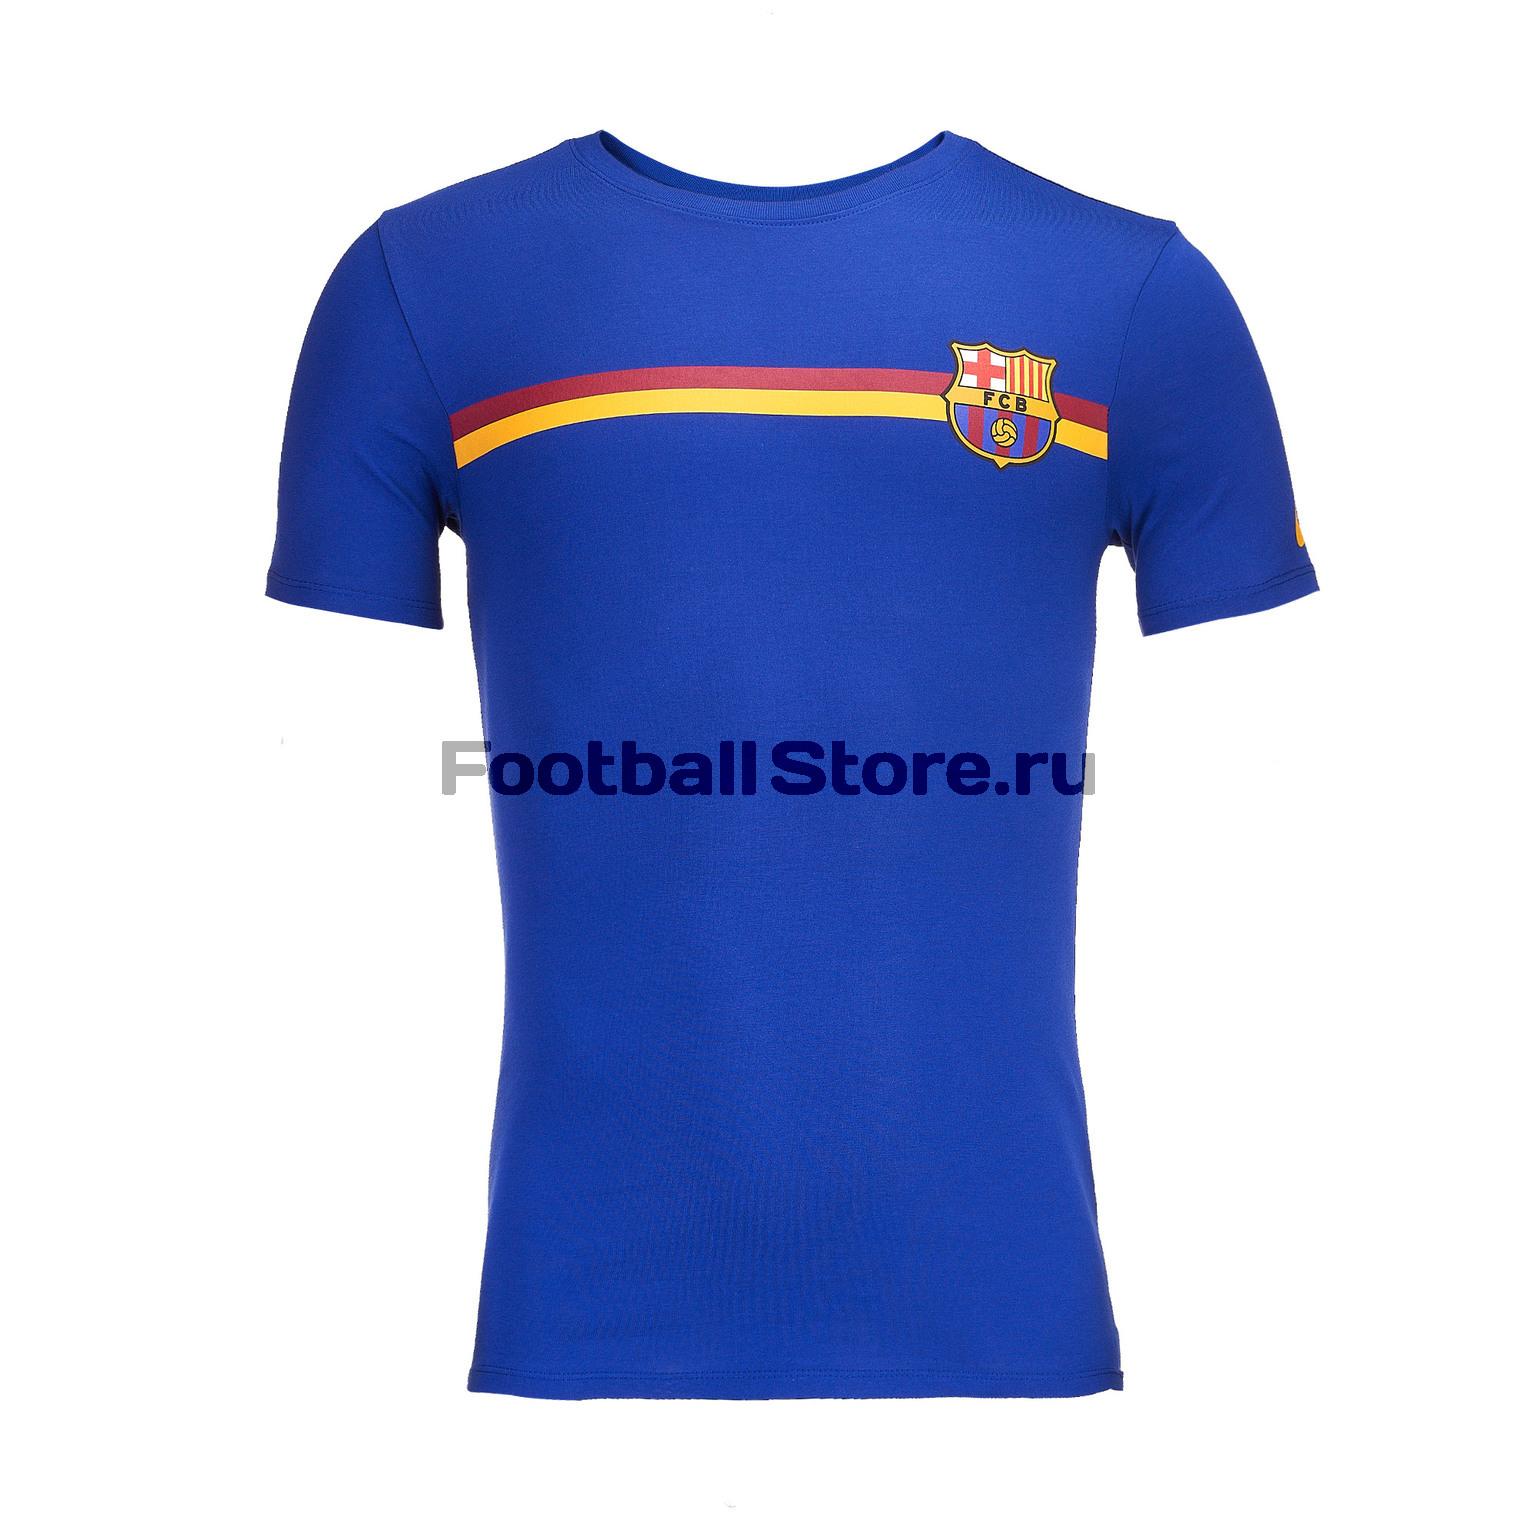 Футболка хлопковая Nike Barcelona 2018/19